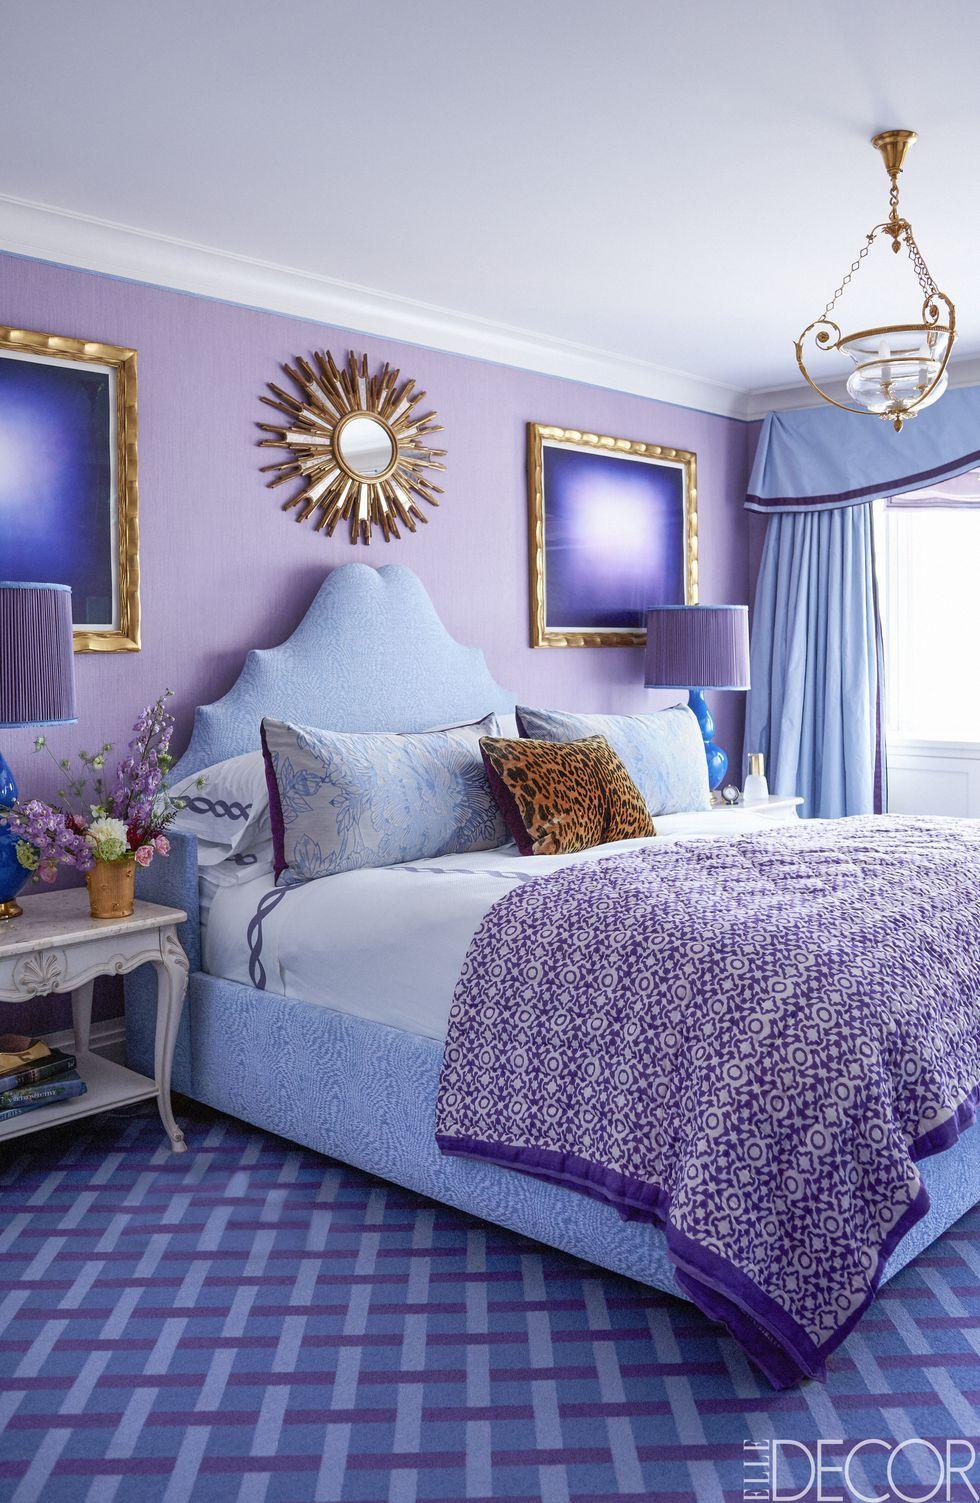 10 stylish purple bedrooms ideas for bedroom decor in purple rh elledecor com bedroom ideas purple and white bedroom ideas with purple and gray